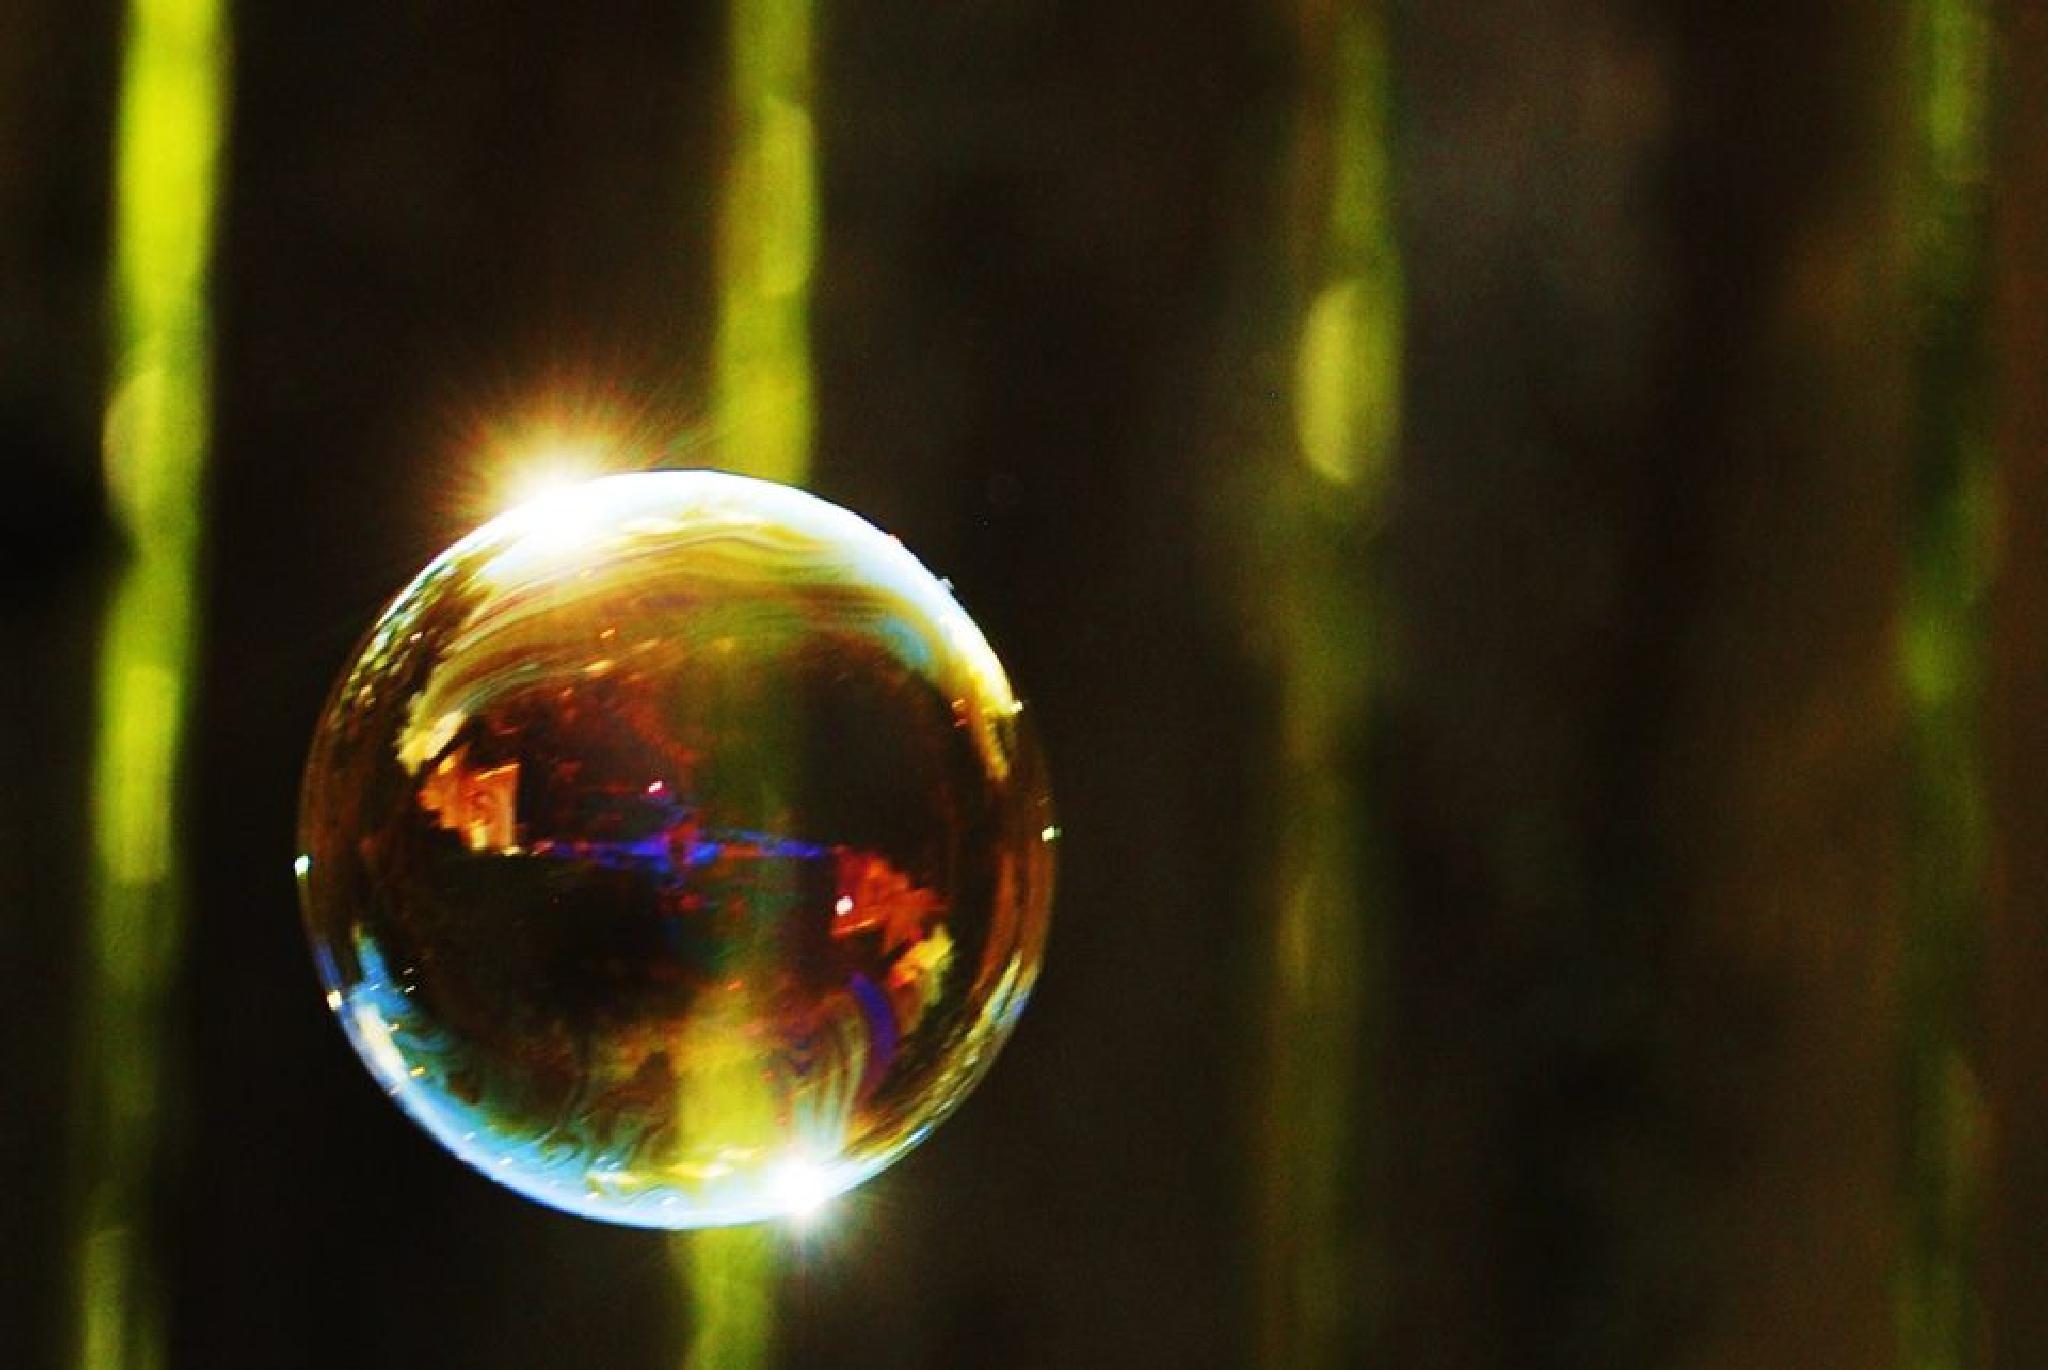 Shiny bubble by Gigi